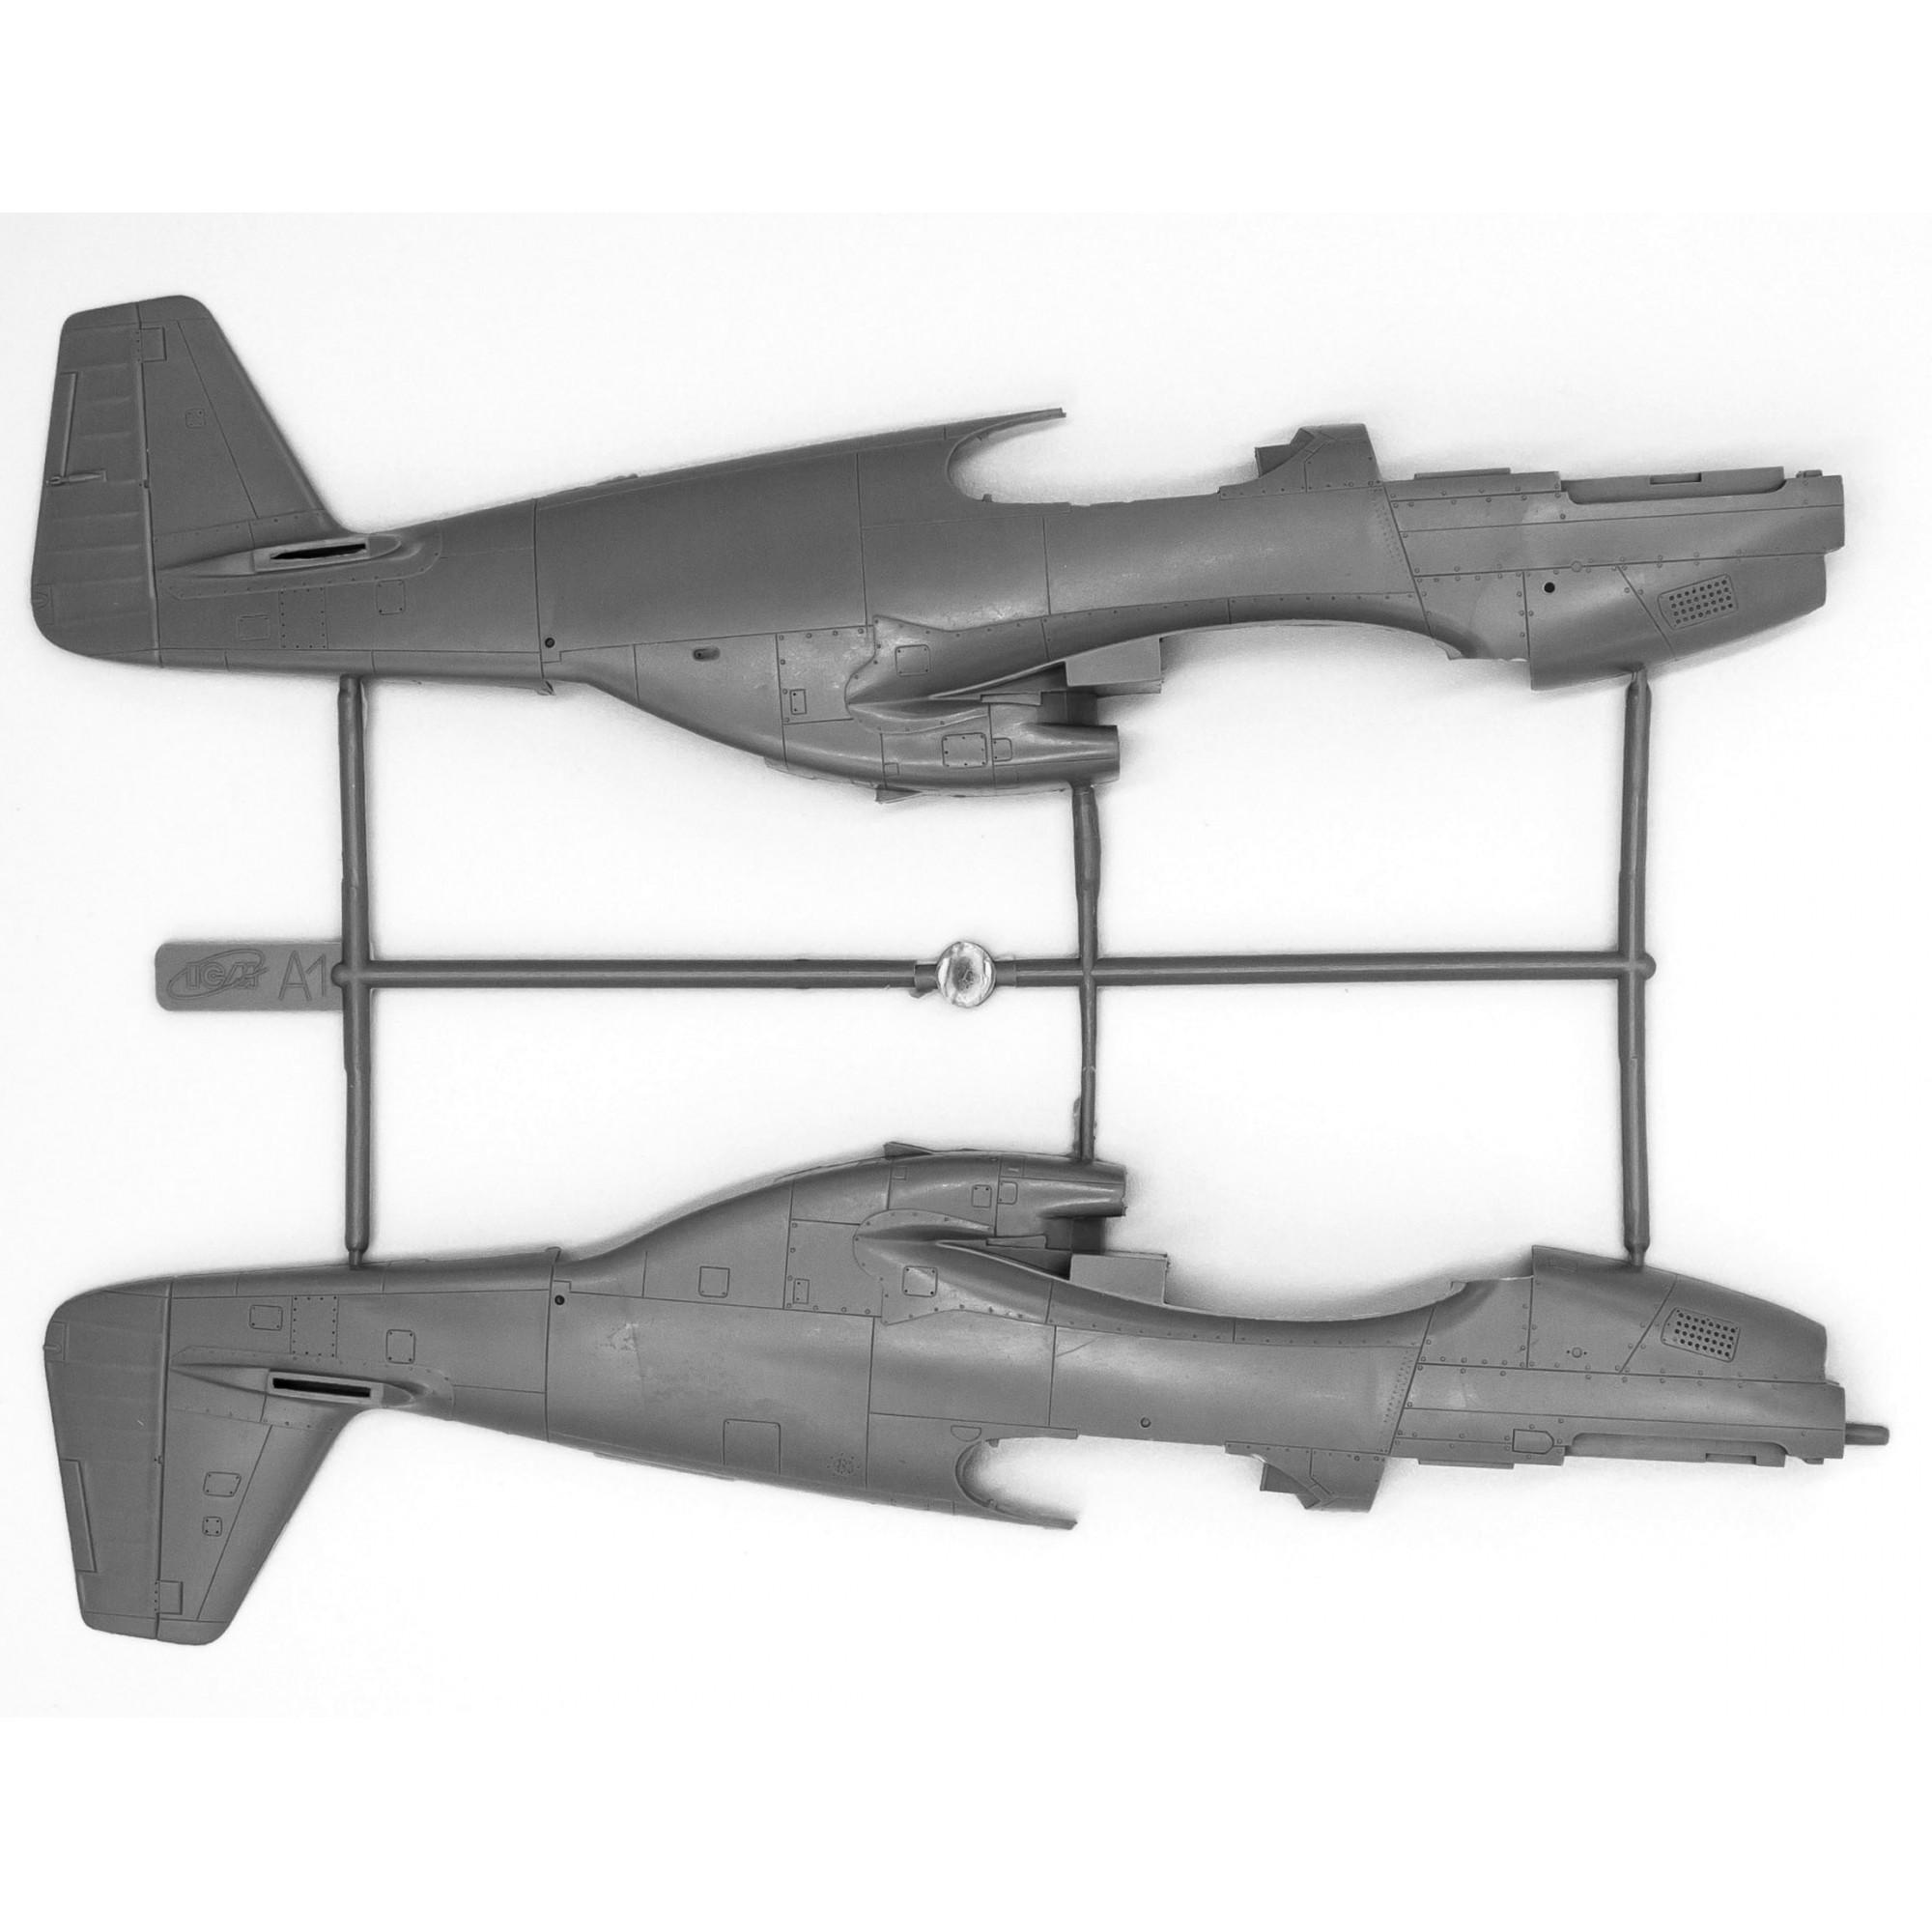 Mustang P-51C -  1/48 - ICM 48121  - BLIMPS COMÉRCIO ELETRÔNICO